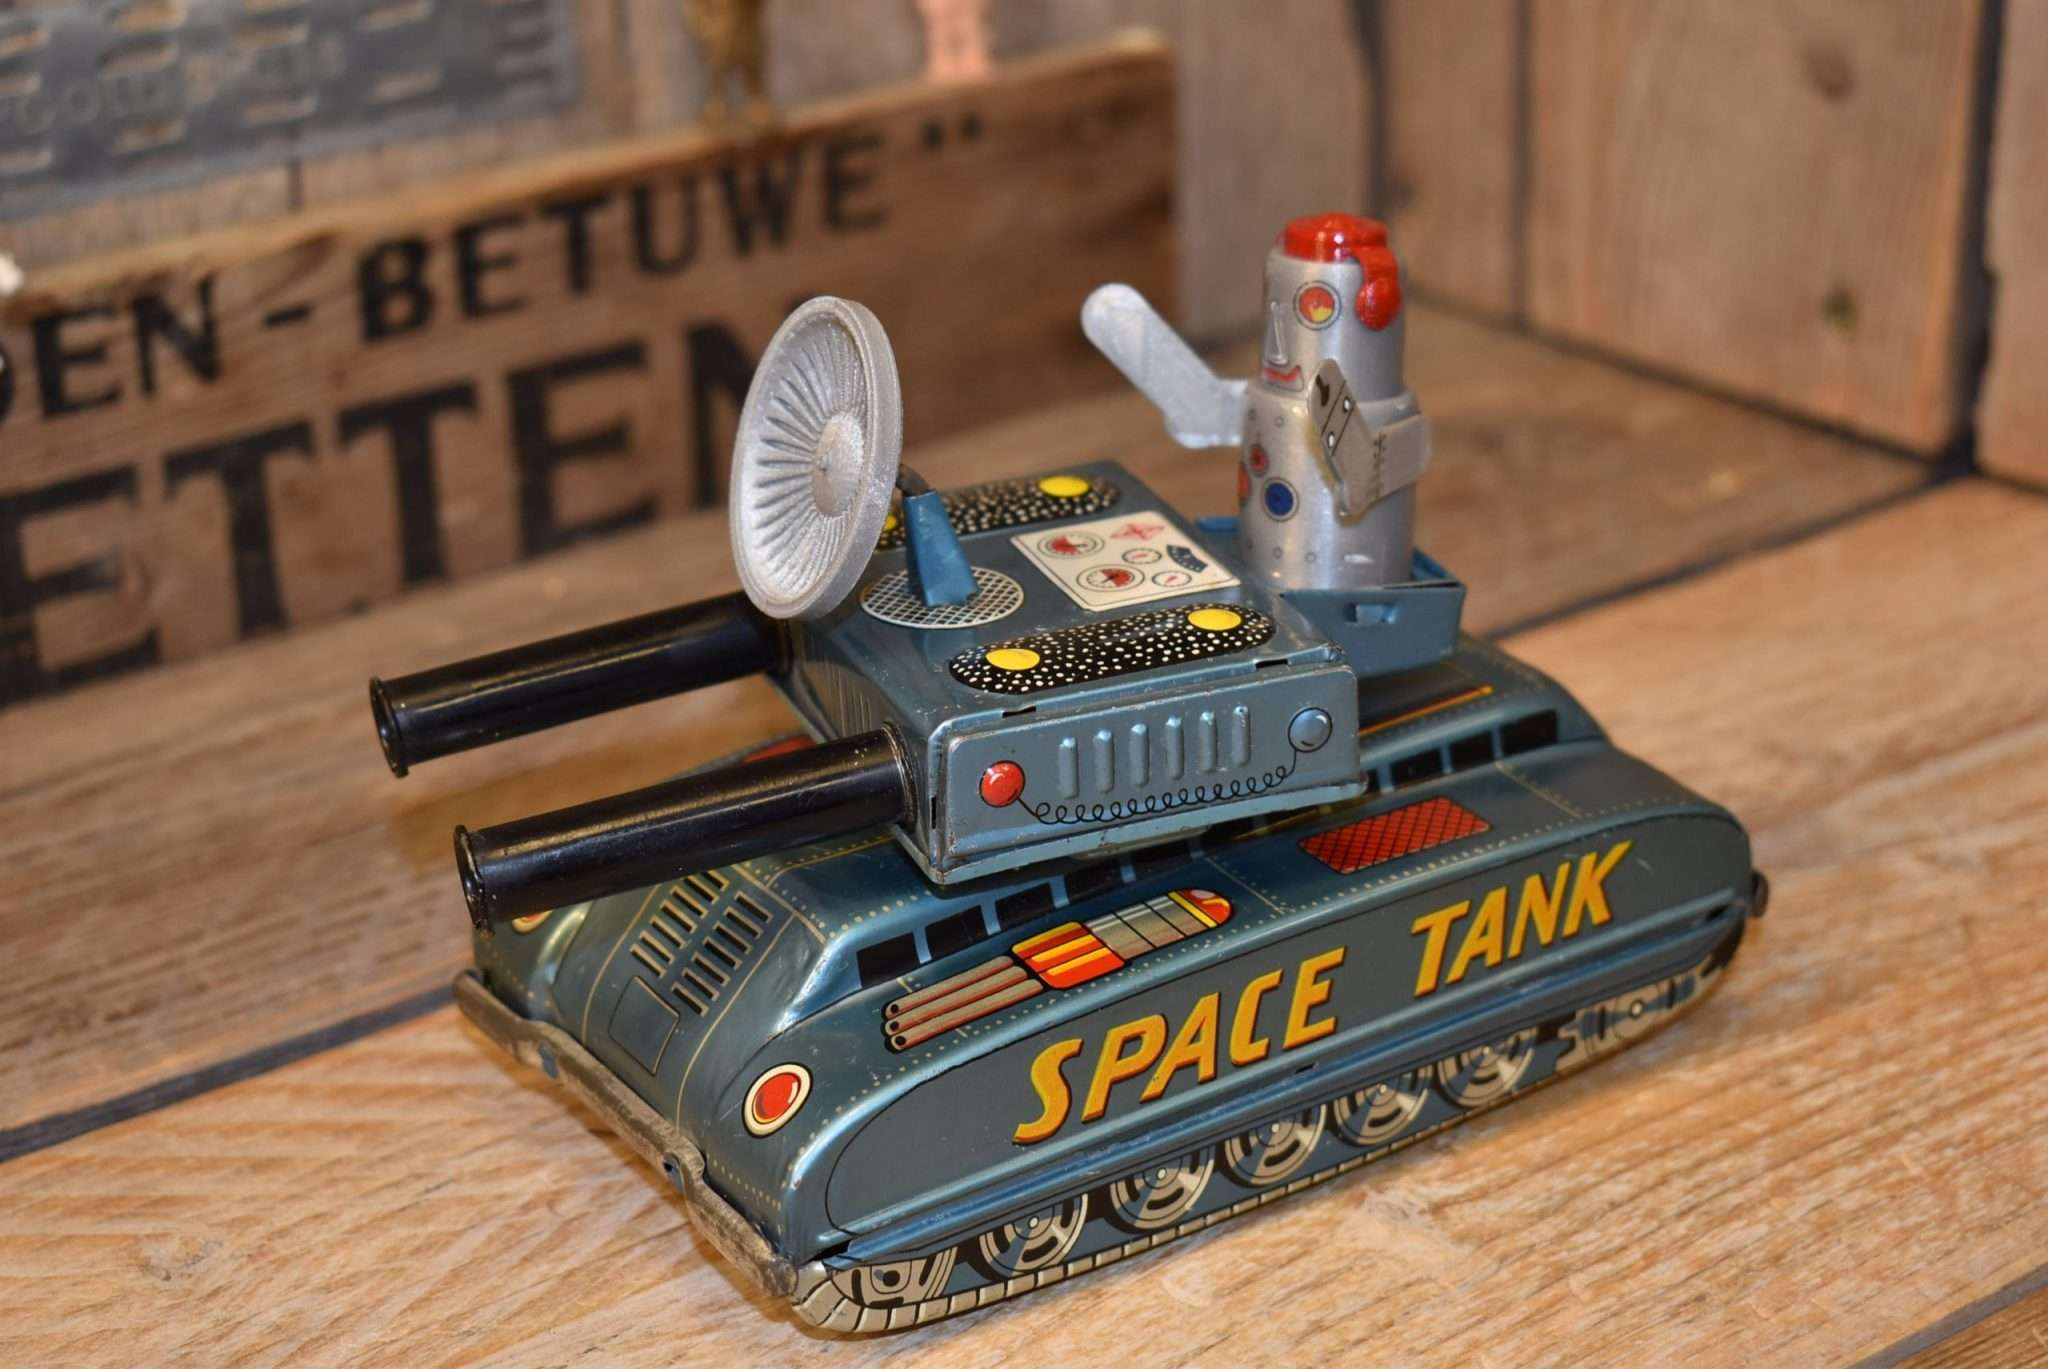 Aoshin - Space Tank